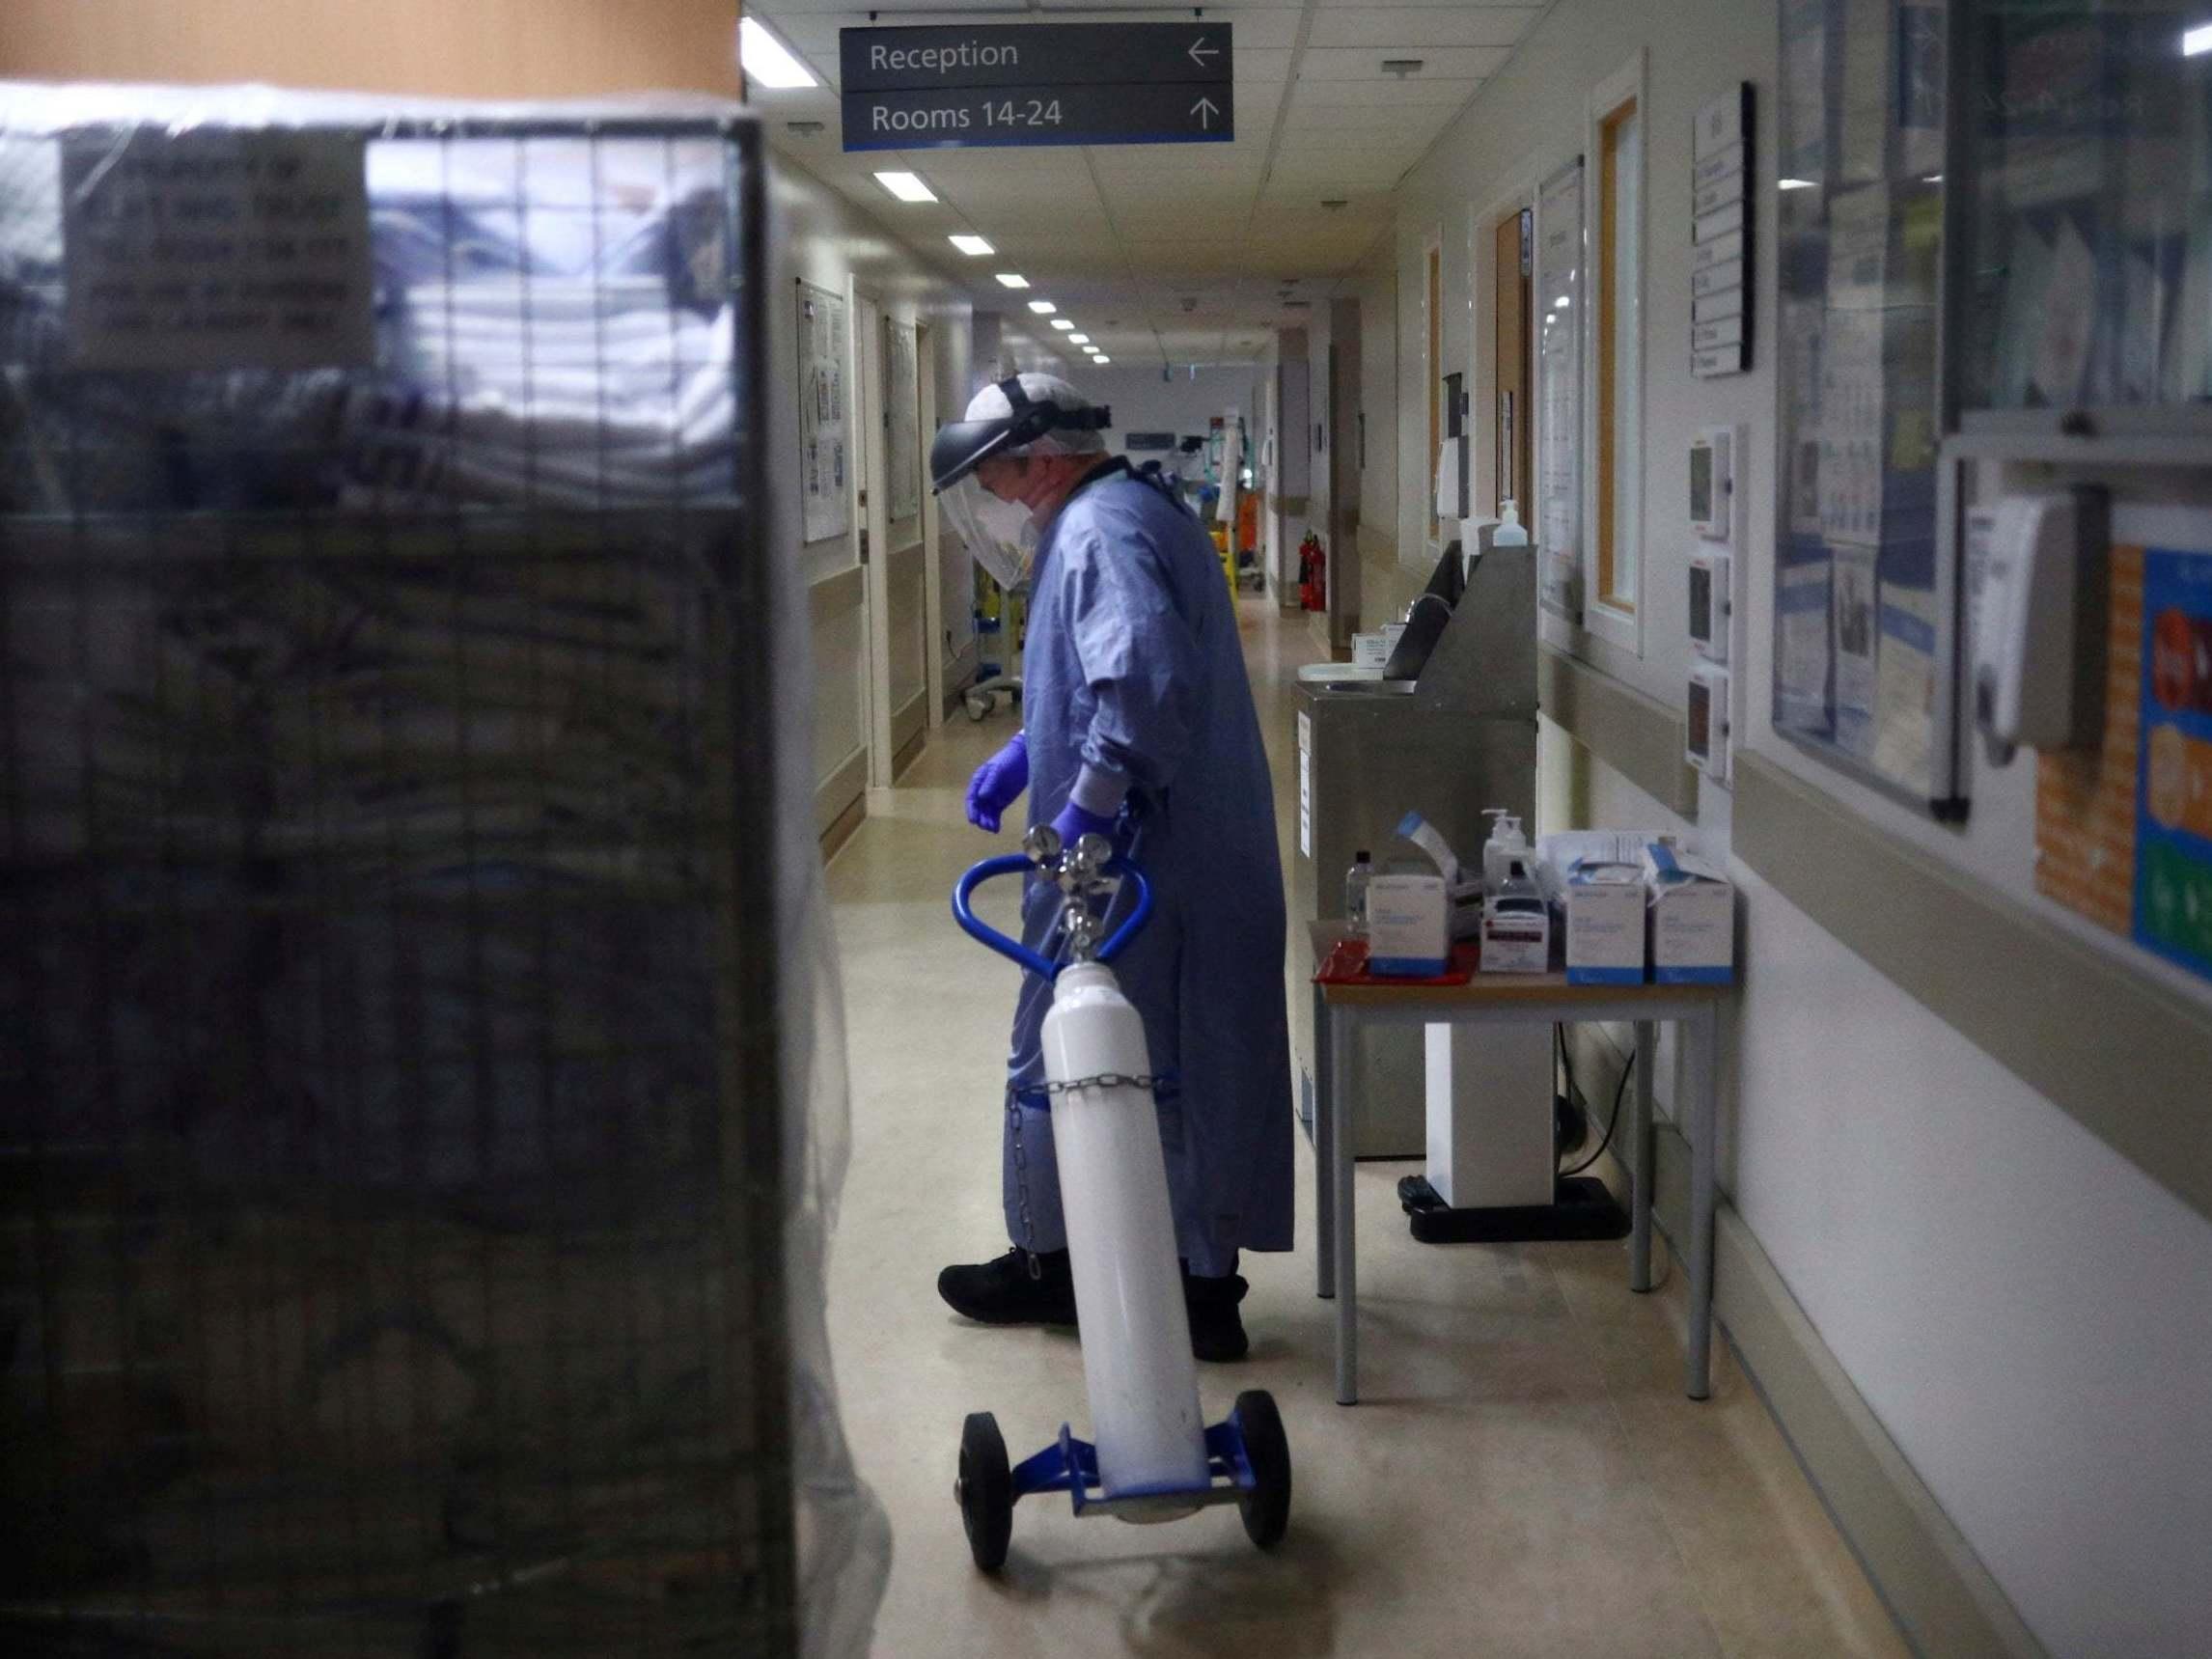 UK coronavirus death toll rises by 338 to 36,042